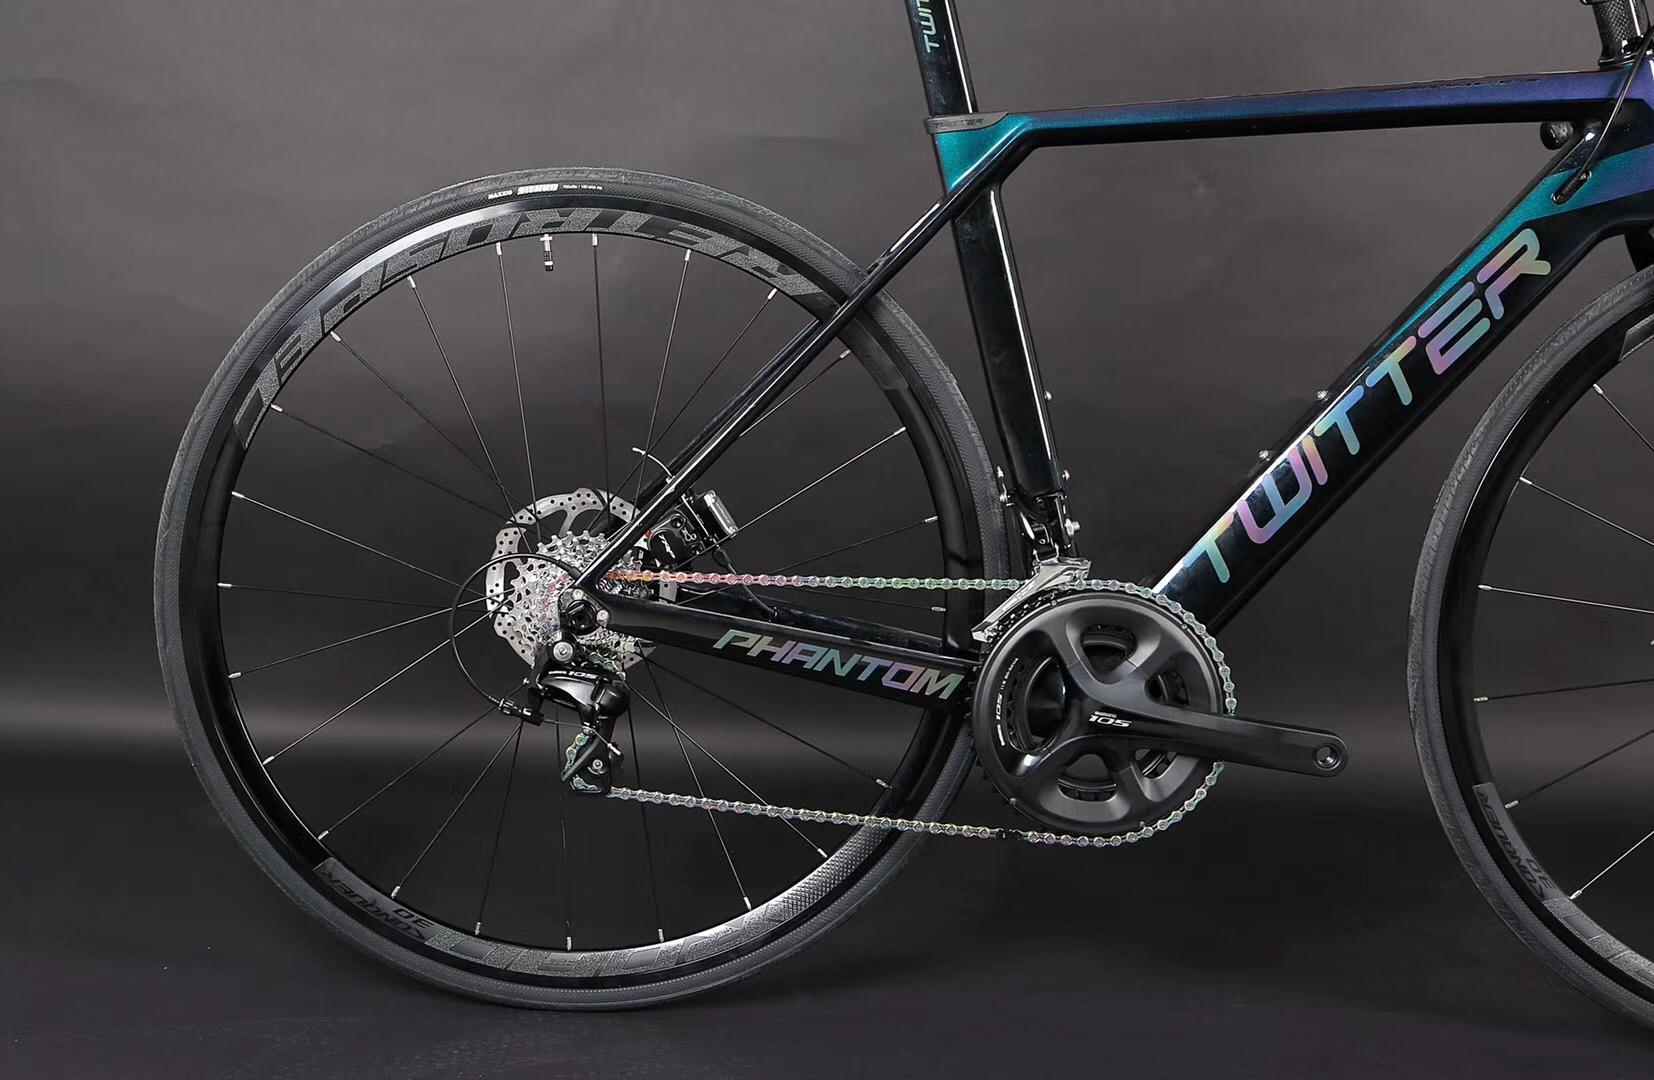 TWITTER carbon road bike  PHANTOM-OFF Road professional road bike  3